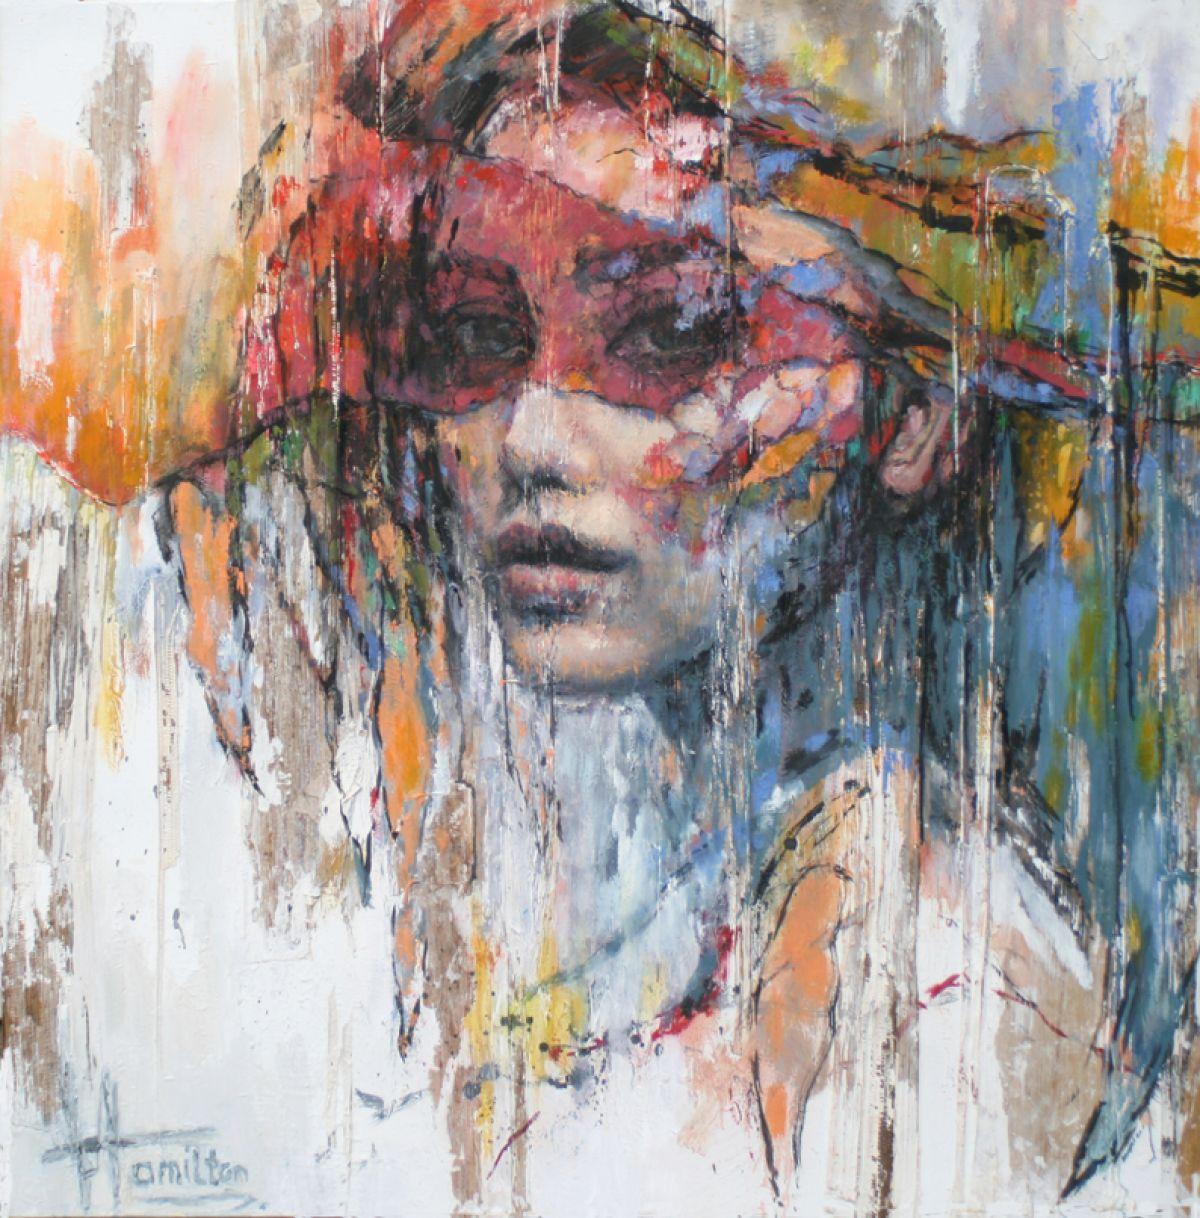 Kunst: Avelon van kunstenaar Evelyn Hamilton